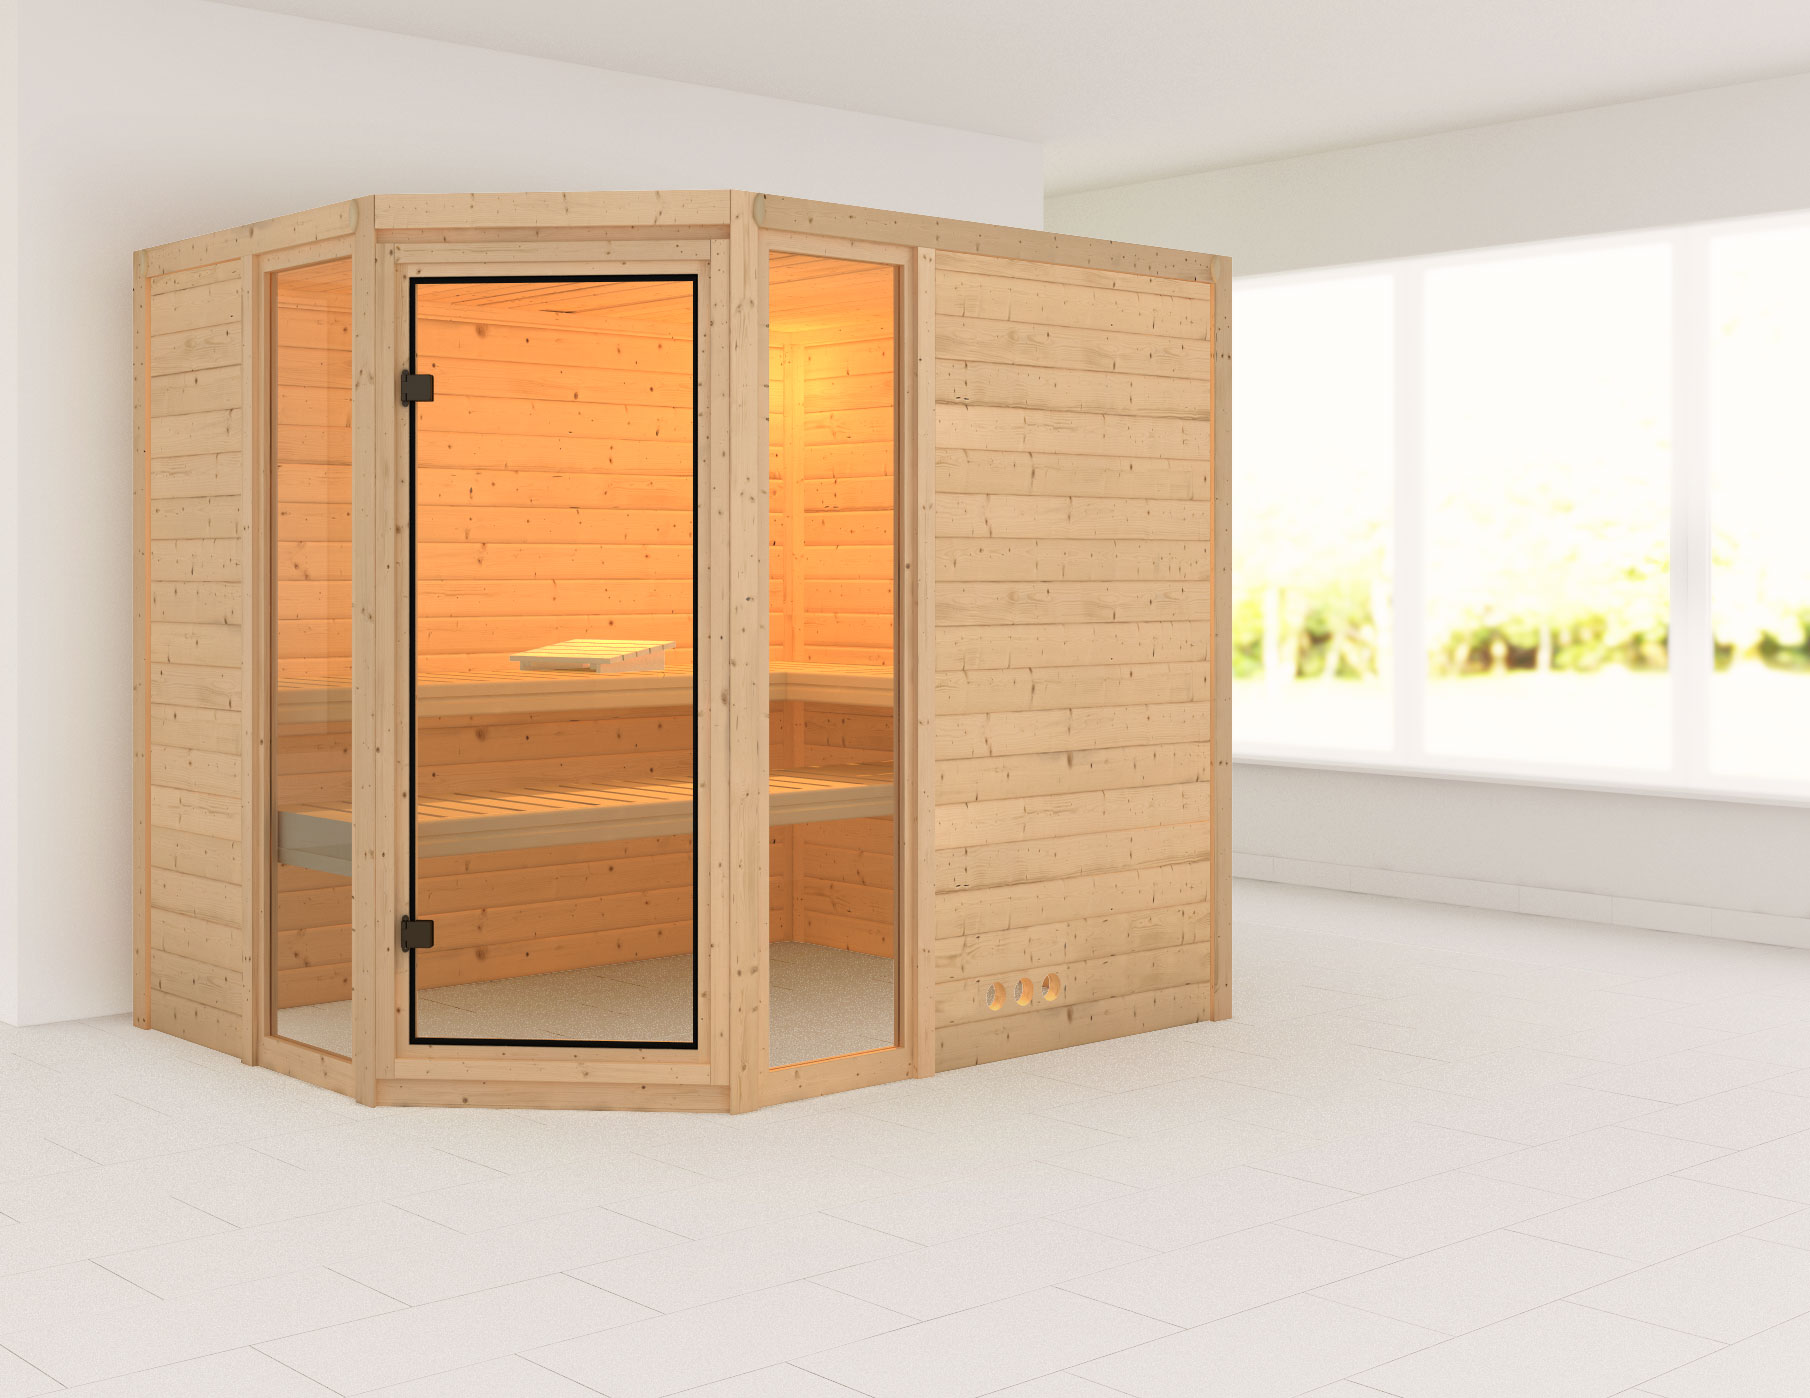 Karibu Sauna Sinai 3 40mm ohne Ofen classic Tür Bild 1